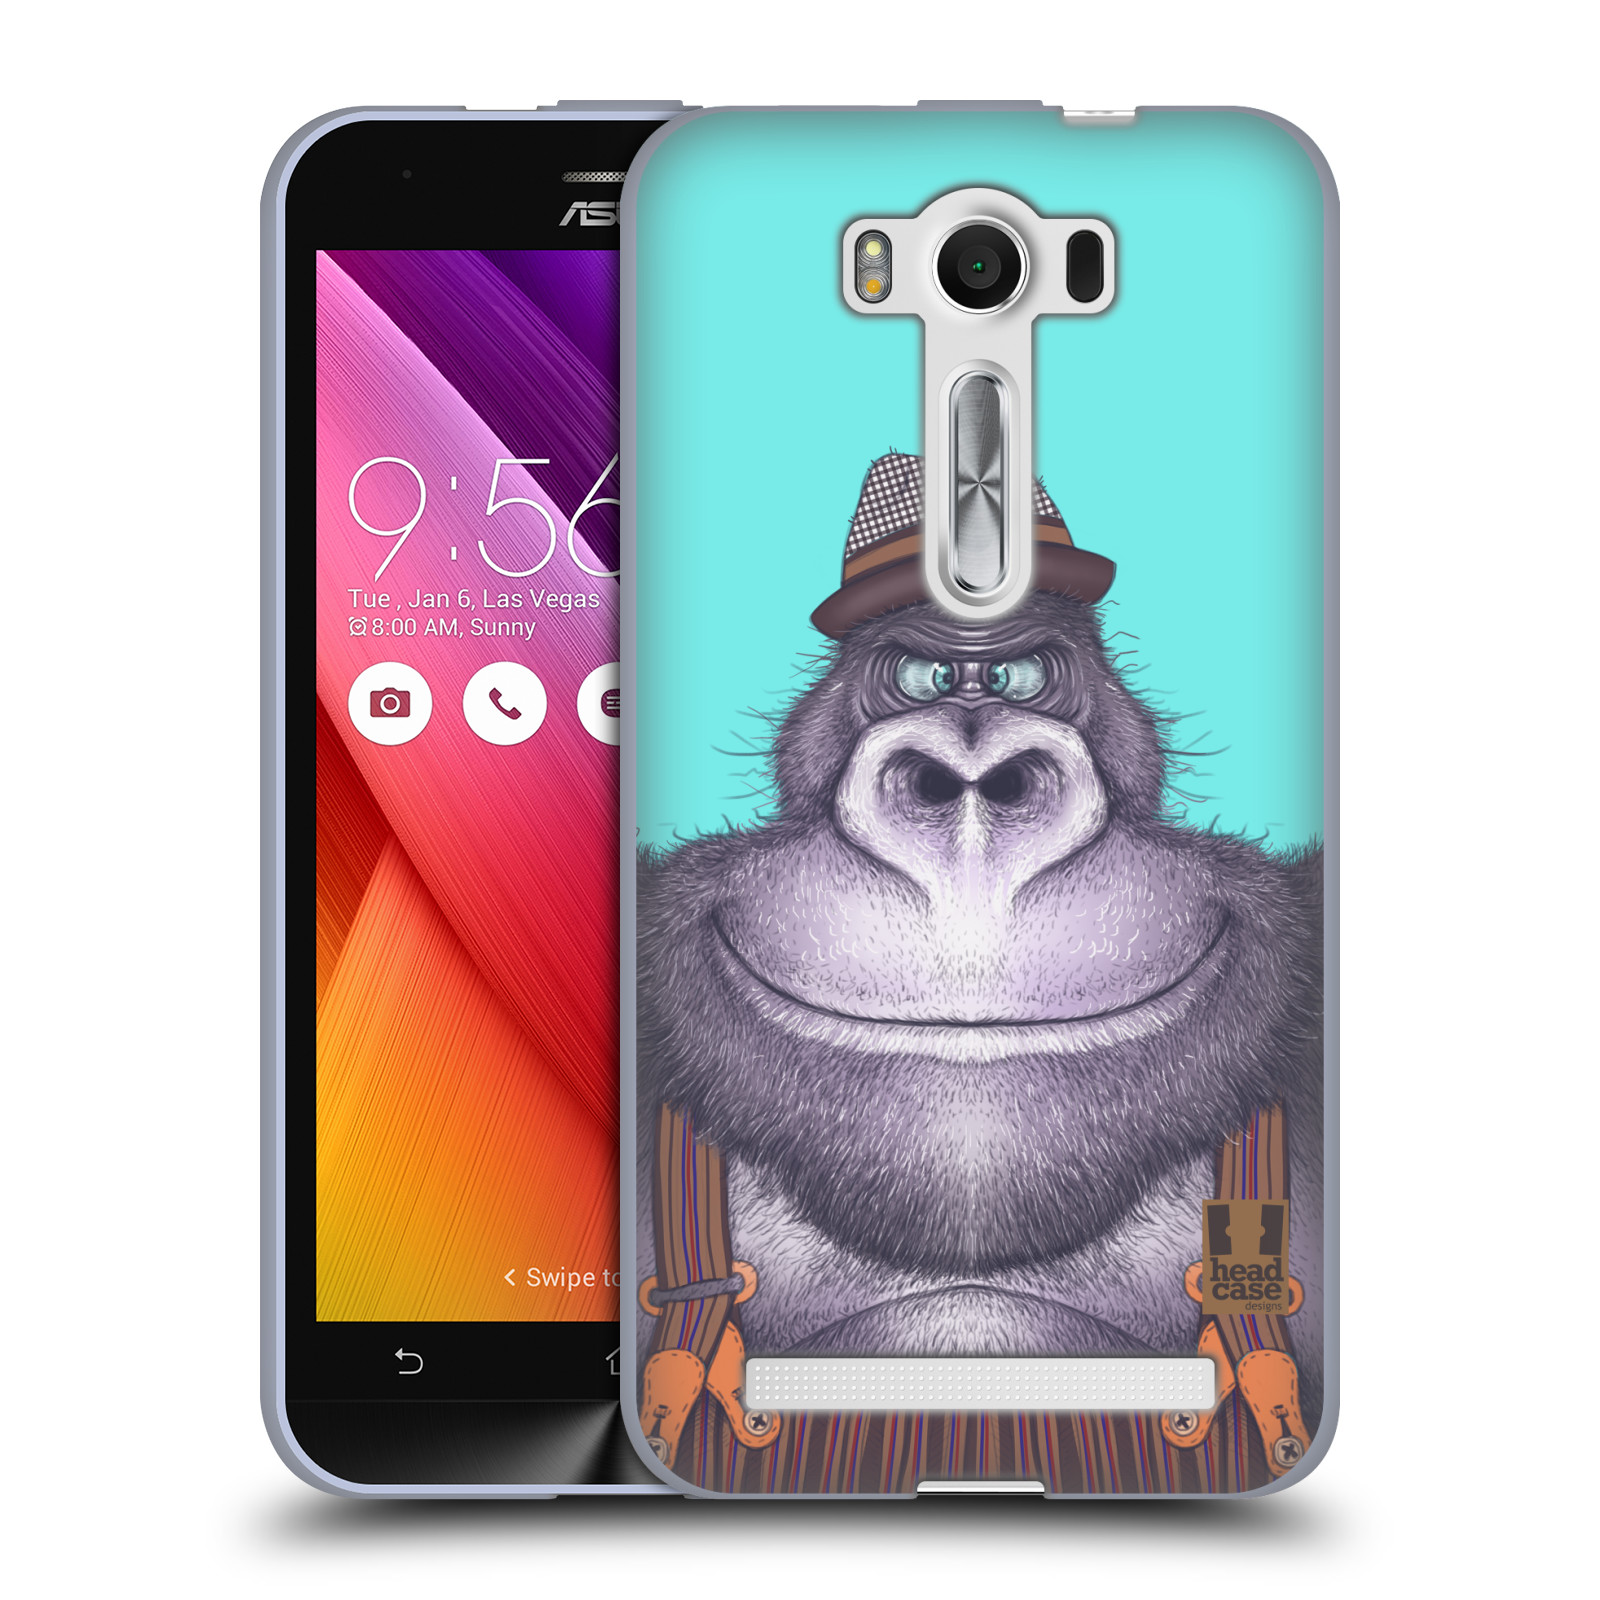 "HEAD CASE silikonový obal na mobil Asus Zenfone 2 LASER (ZE500KL s 5"" displejem) vzor Kreslená zvířátka gorila"